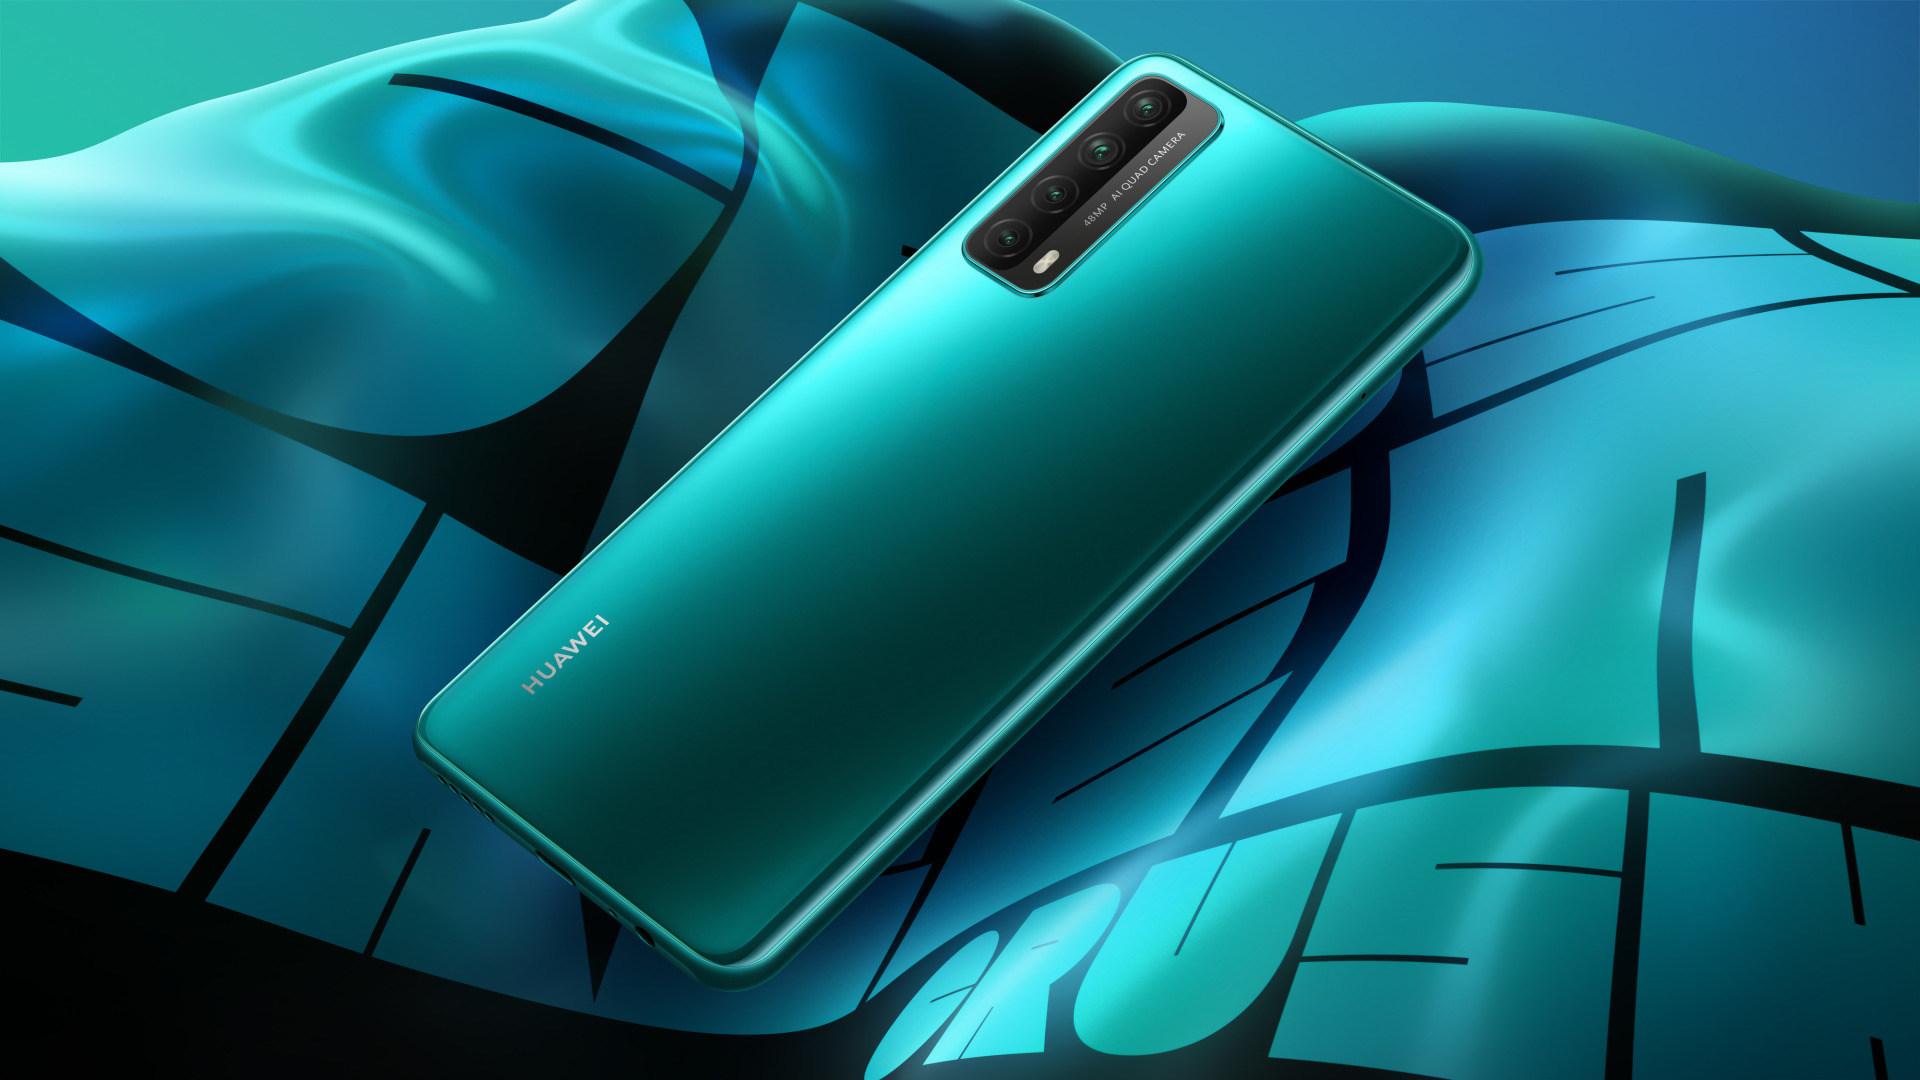 Smartphone, Huawei, Huawei Mobile Services, HMS, Huawei P Smart 2021